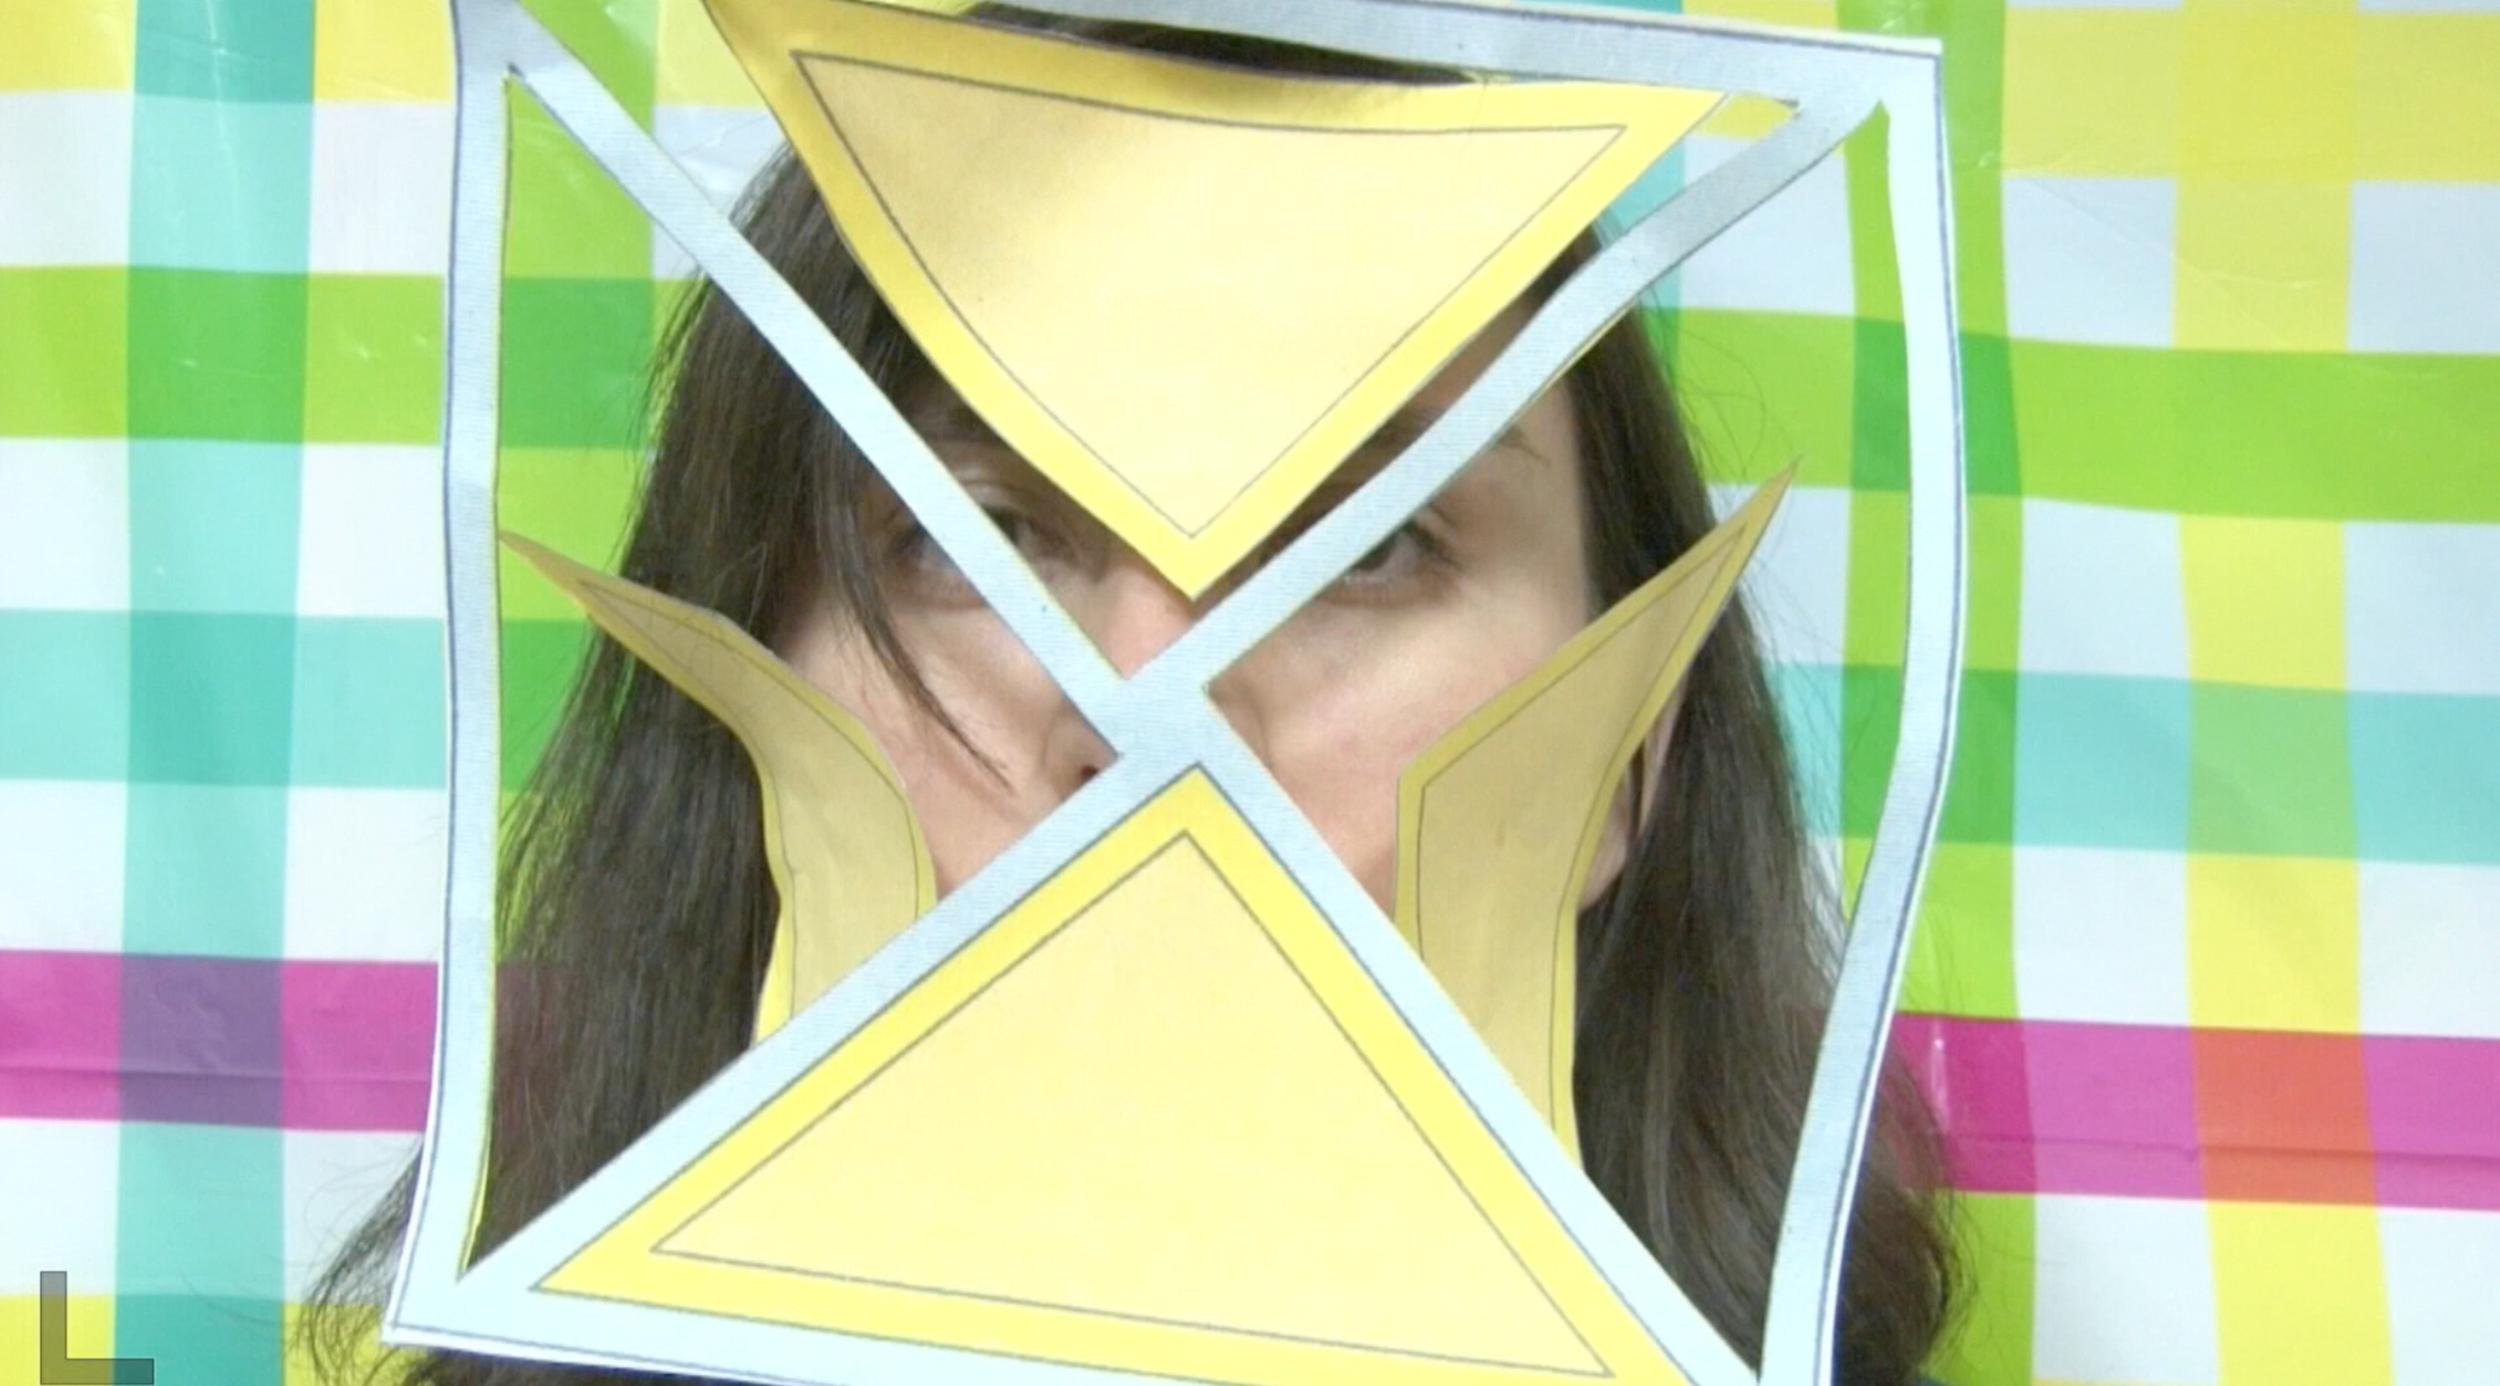 Nina Yuen   Hermione , 2013 single-channel video with sound 9 min. 49 sec.